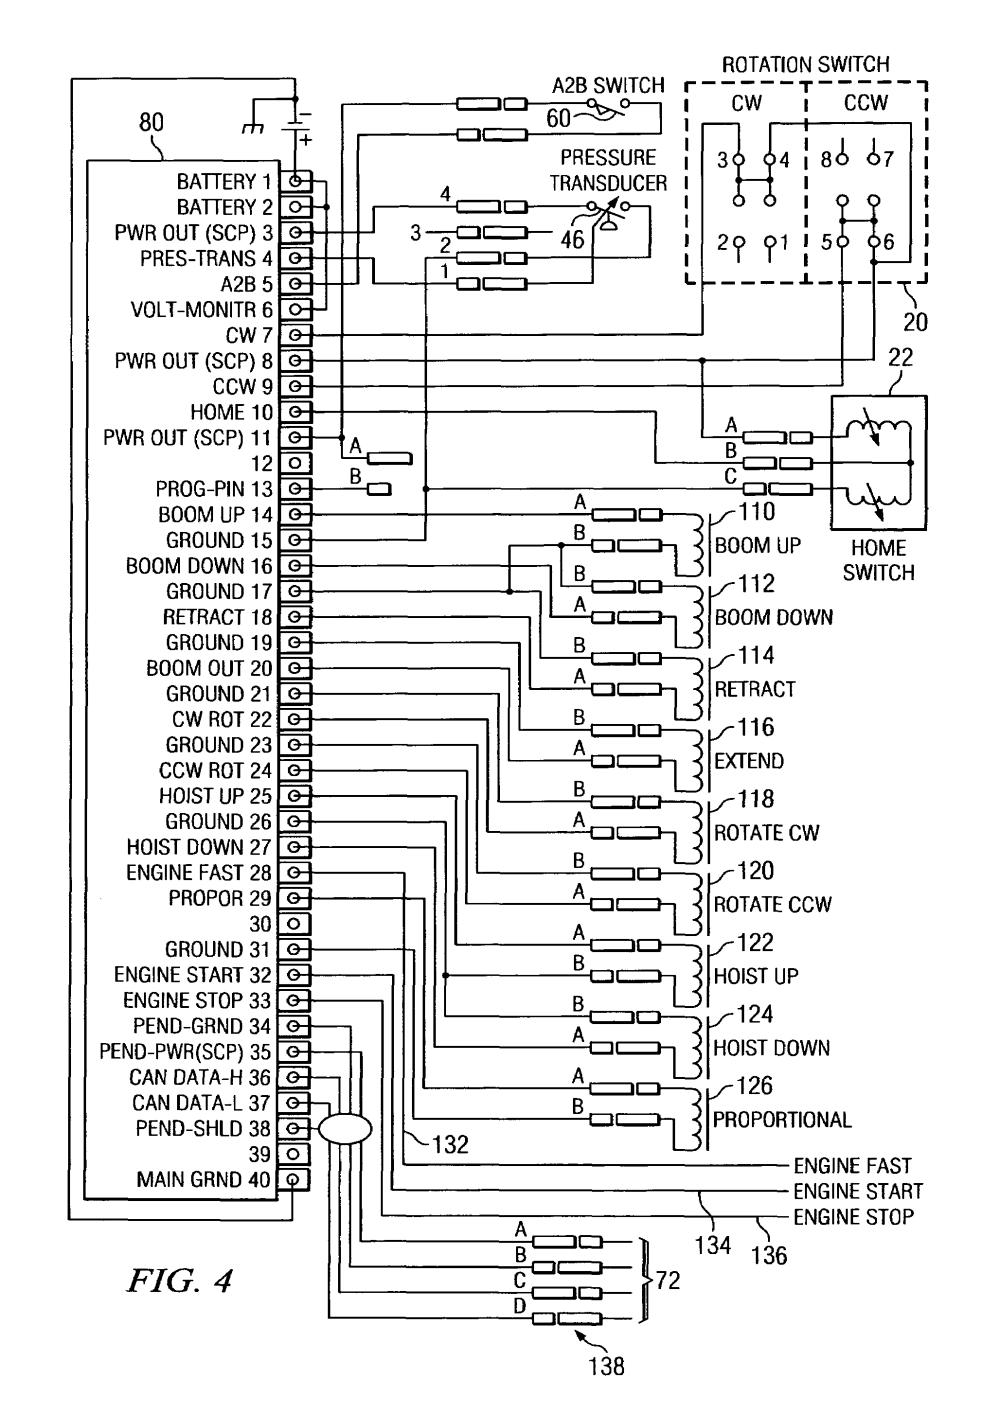 medium resolution of grove crane electrical diagram simple wiring schemagrove crane wiring diagram simple wiring schema potain self erecting